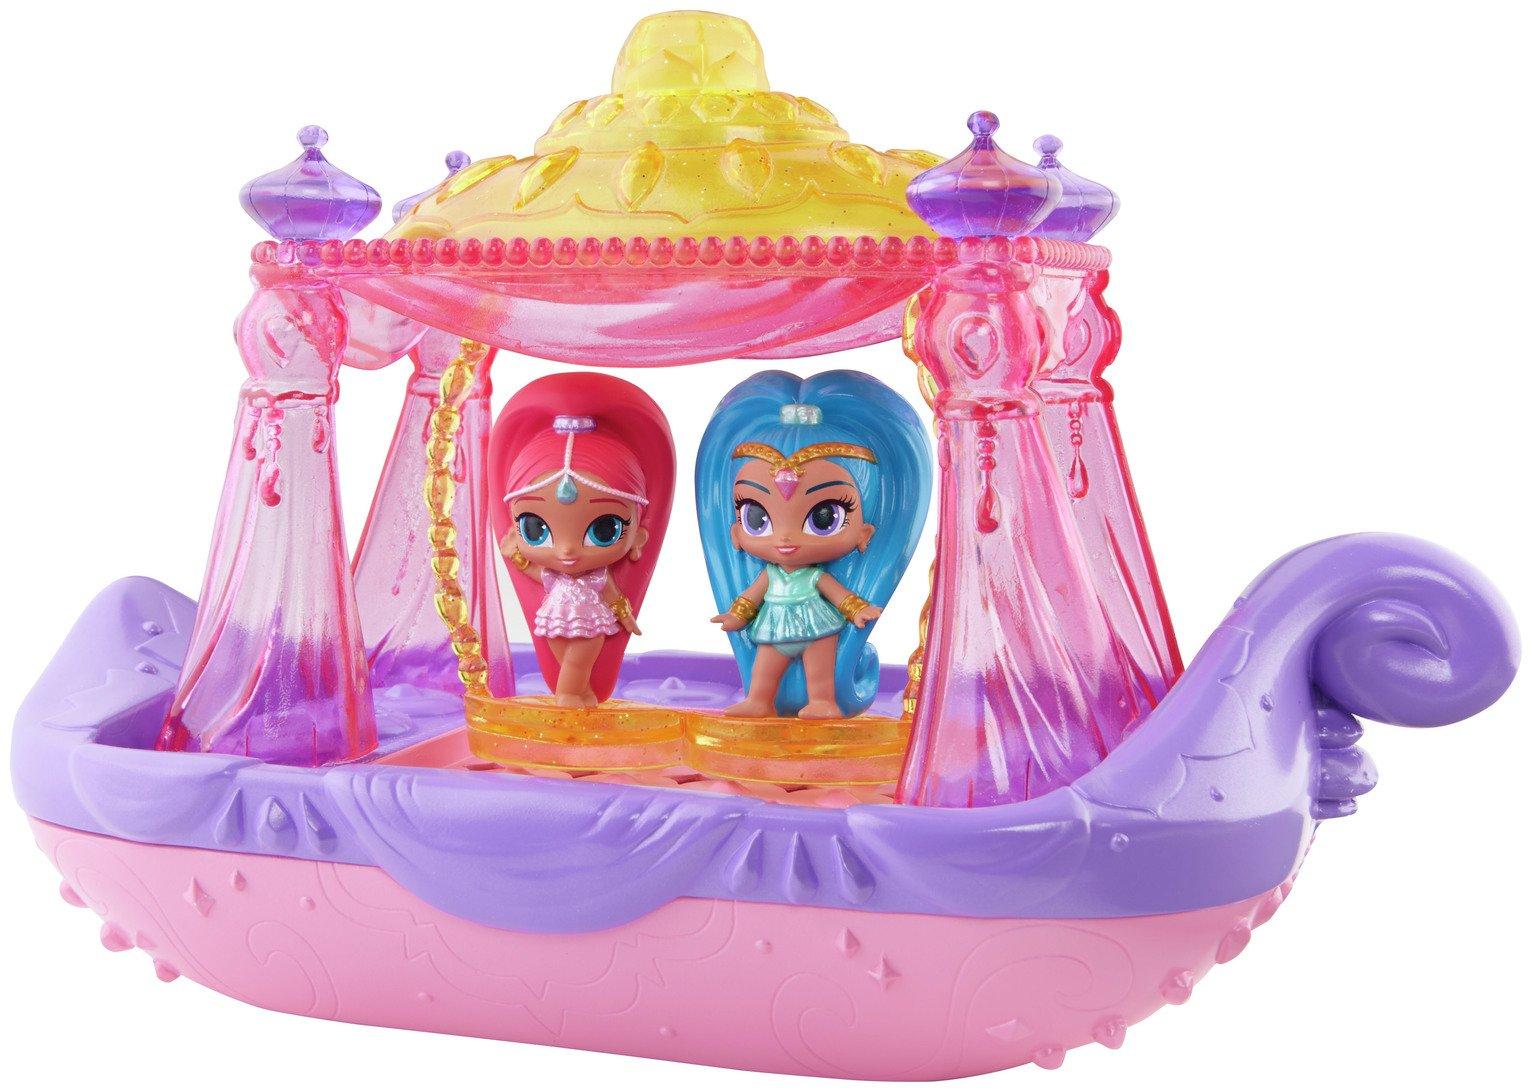 Image of Shimmer and Shine Swing & Splash Genie Boat